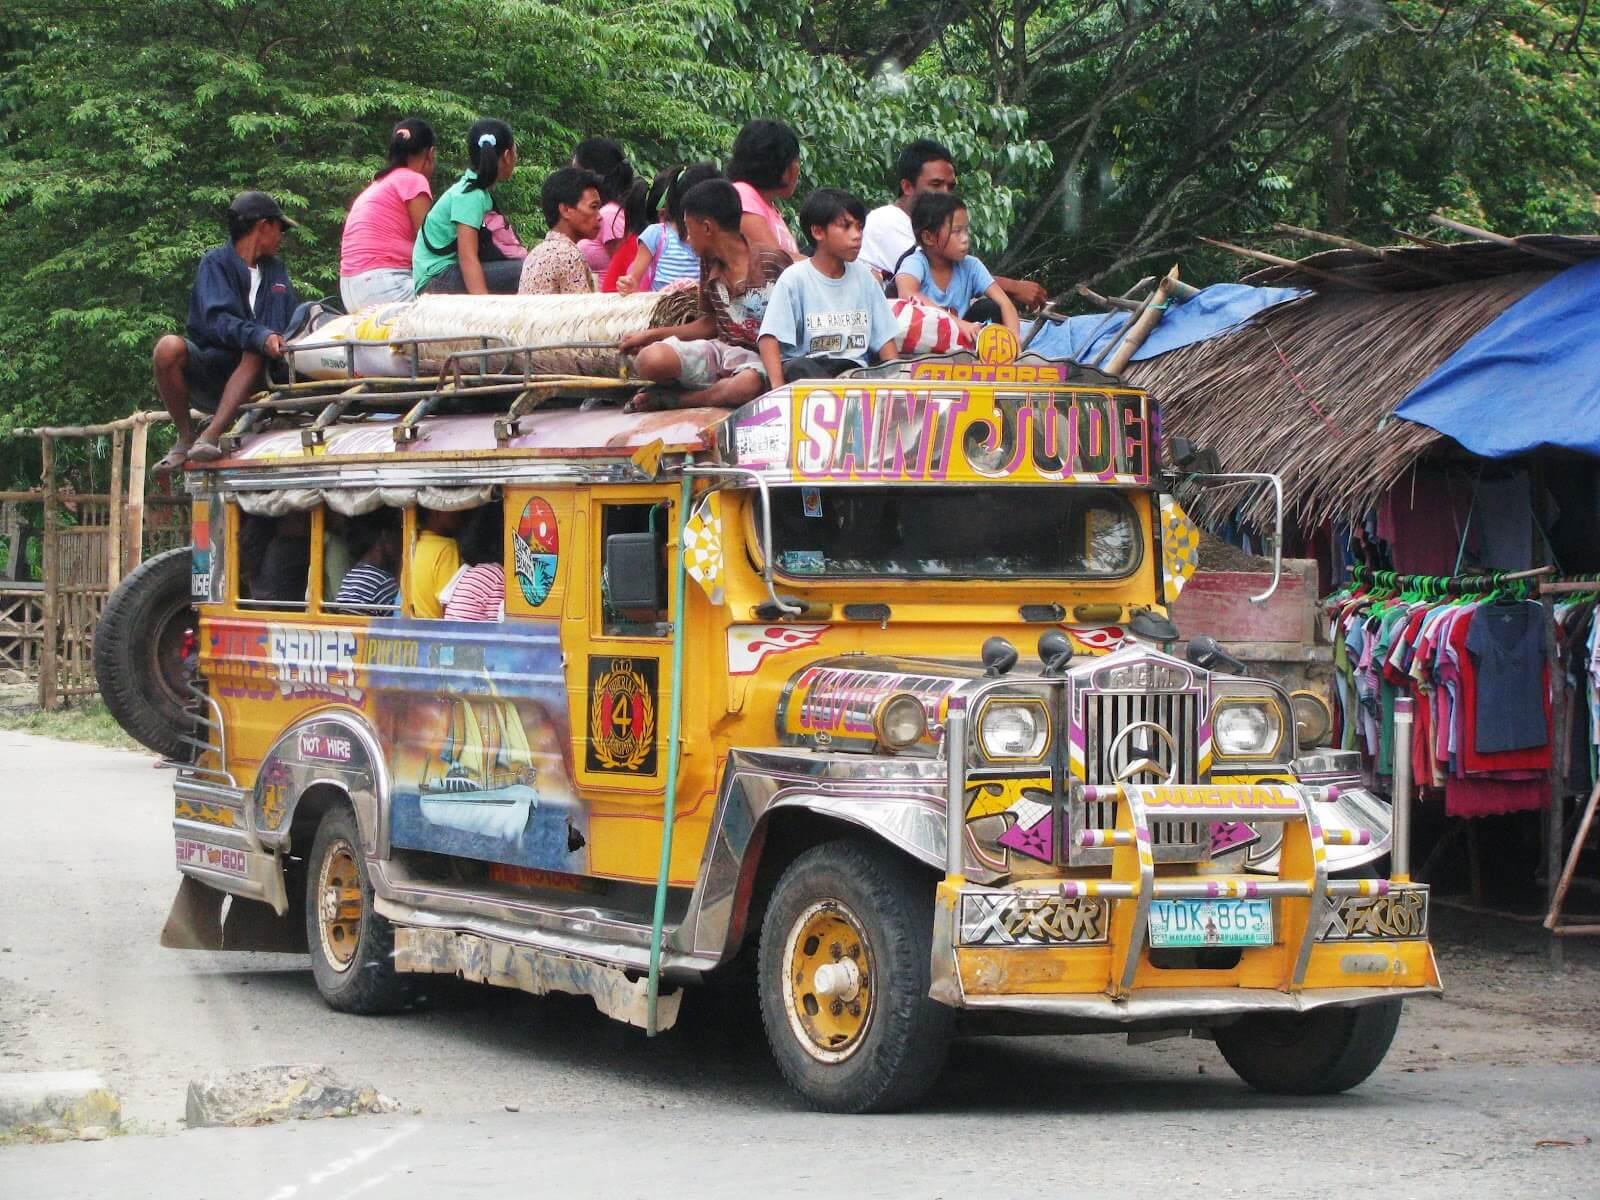 Itinerarios para conocer Filipinas en 5 días